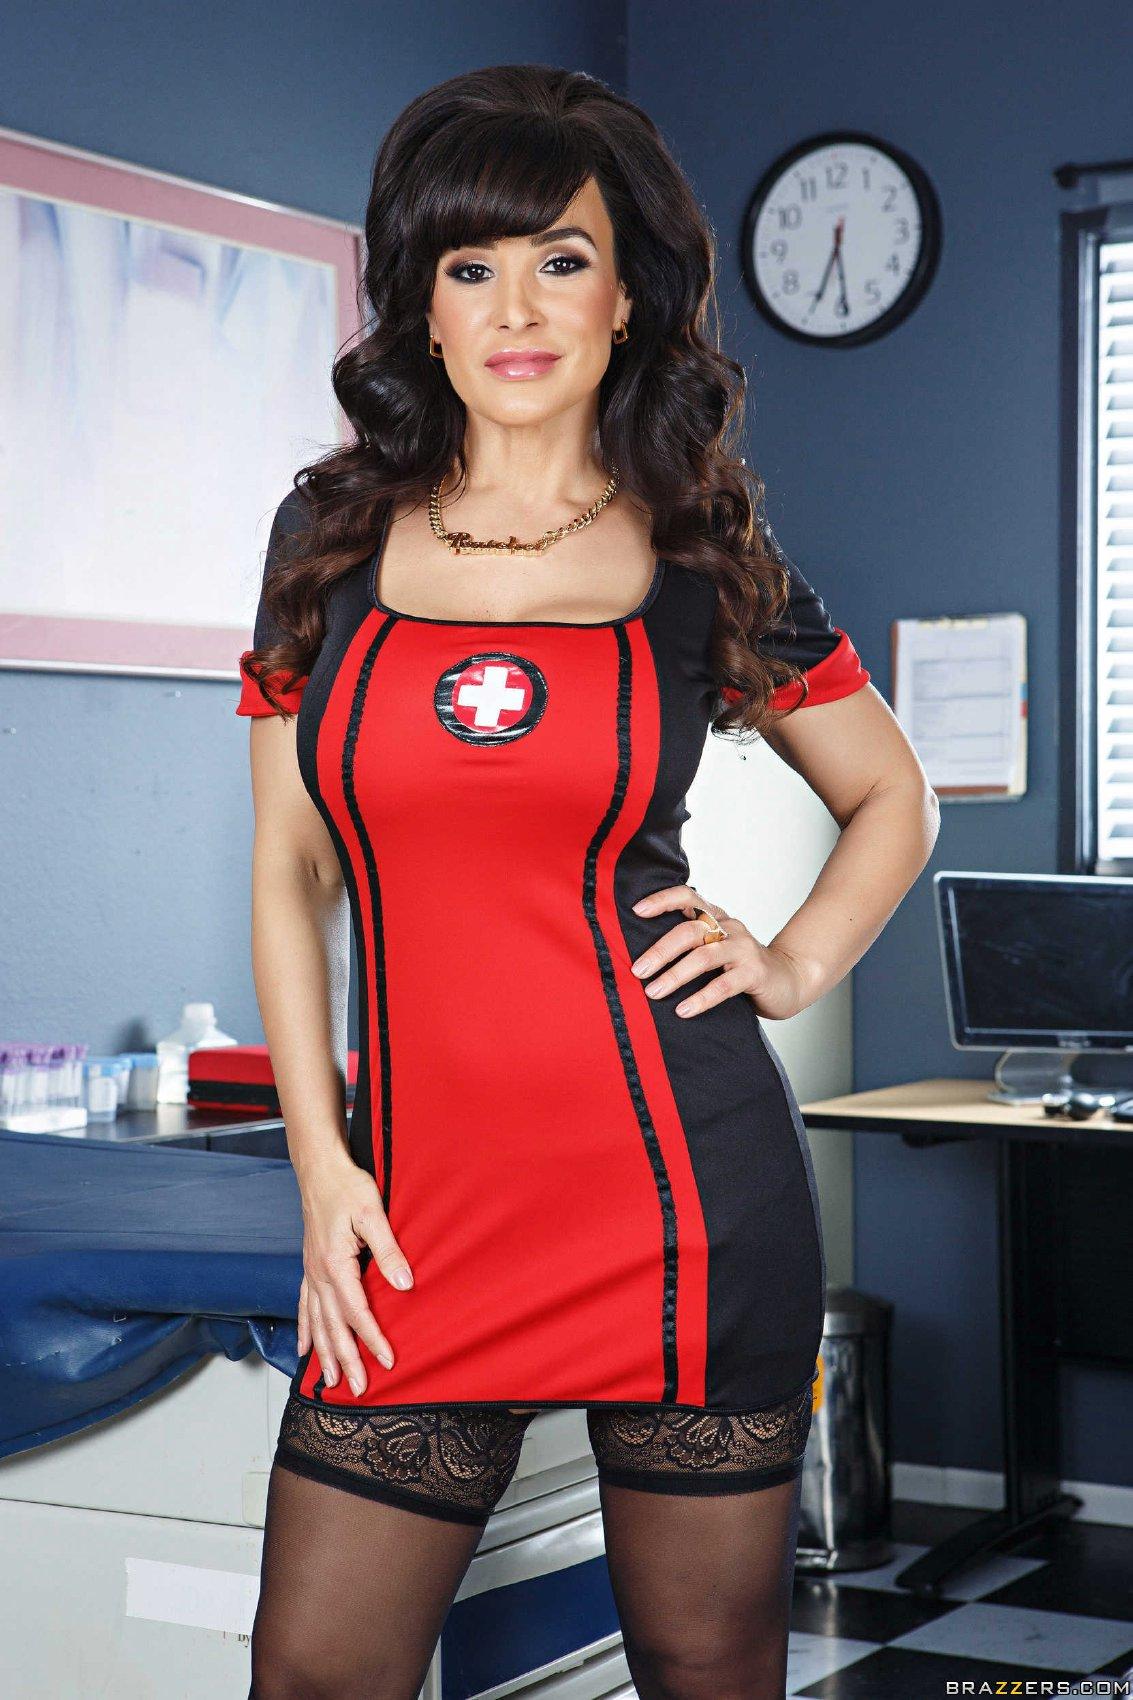 Hot Lisa Ann Pic hot nurse lisa ann in black stockings and heels posing for